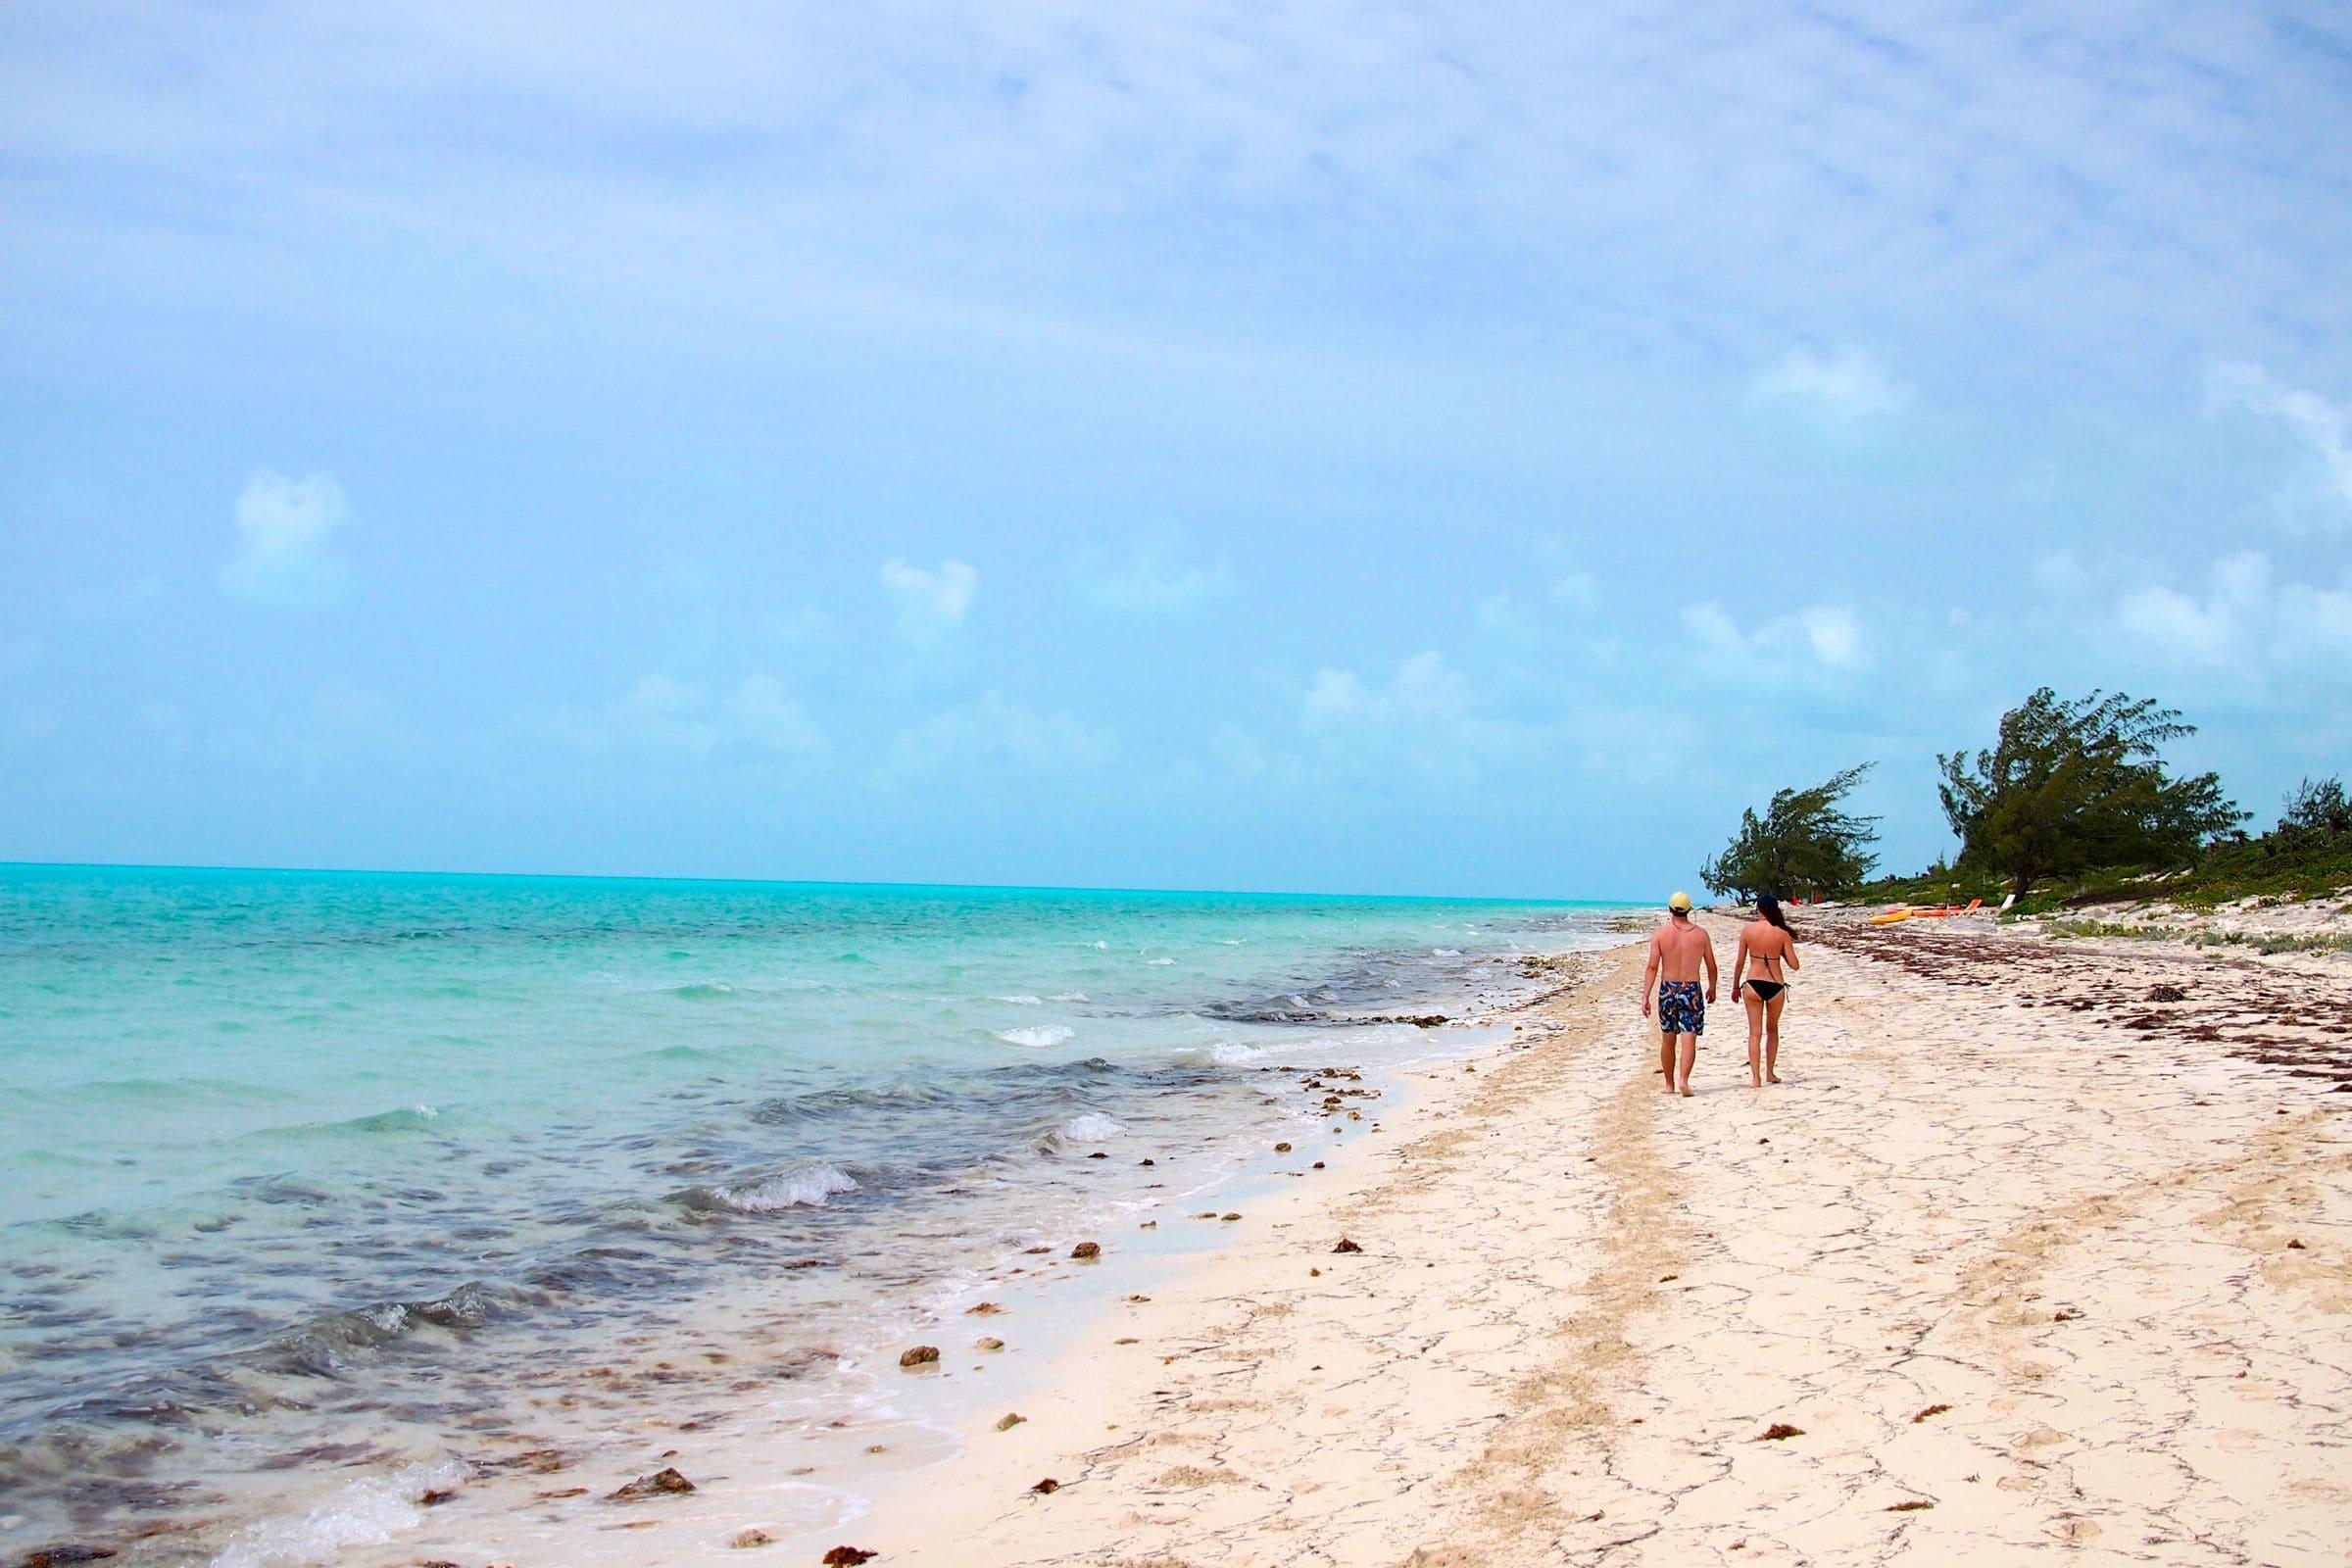 Beachcombing Along Long Bay Turks And Caicos